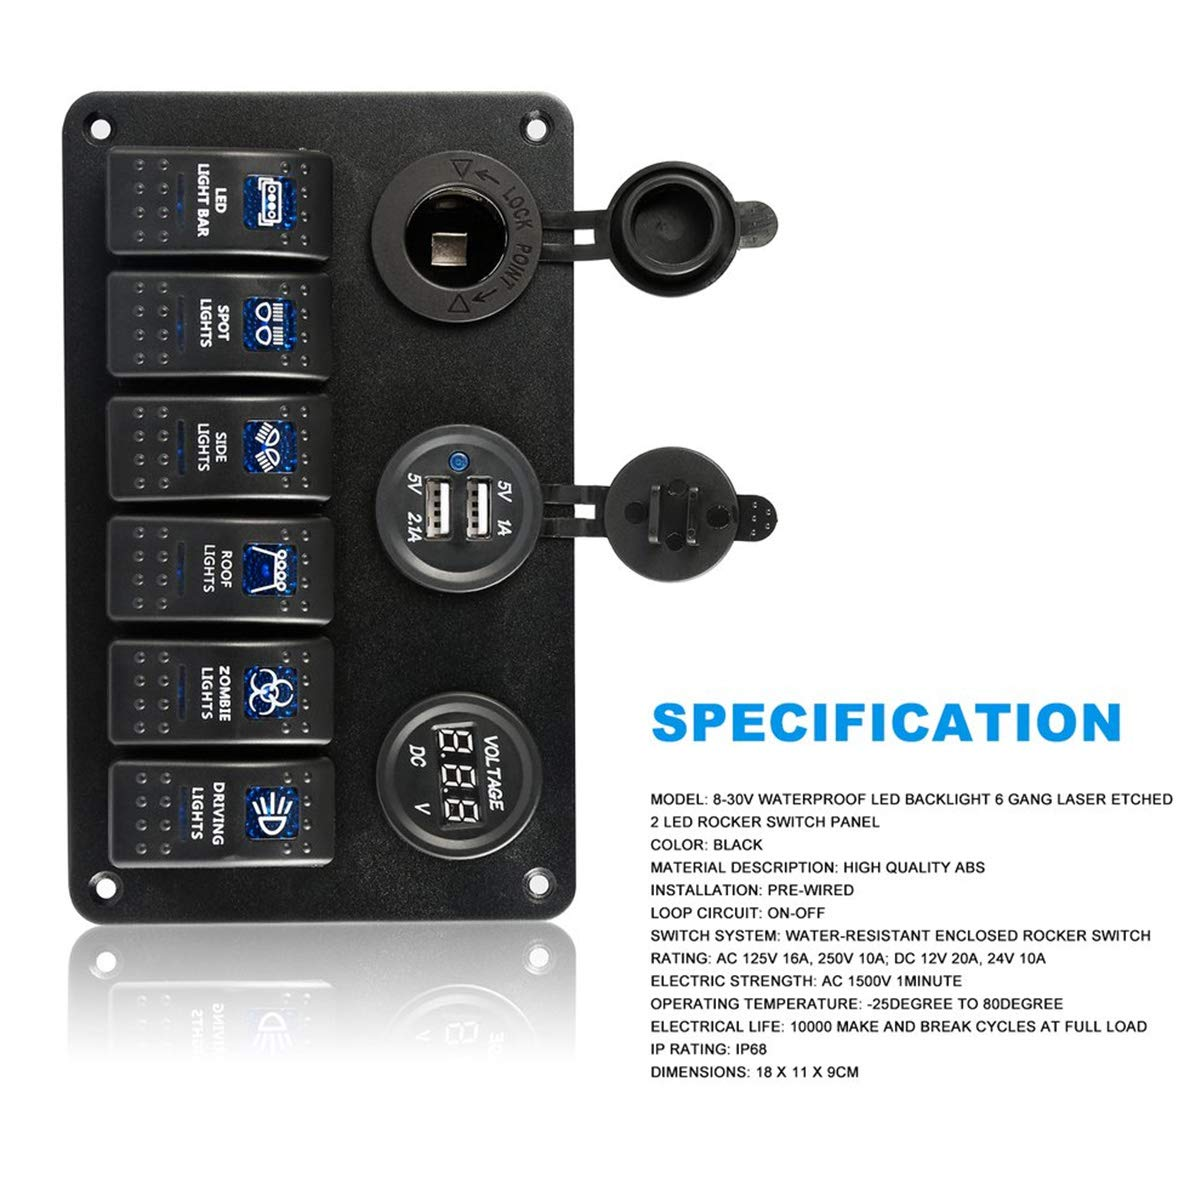 DEALPEAK 6 Gang Waterproof Rocker Switch Control Panel with LED Indicator Light Dual USB Port for Car Marine Boat